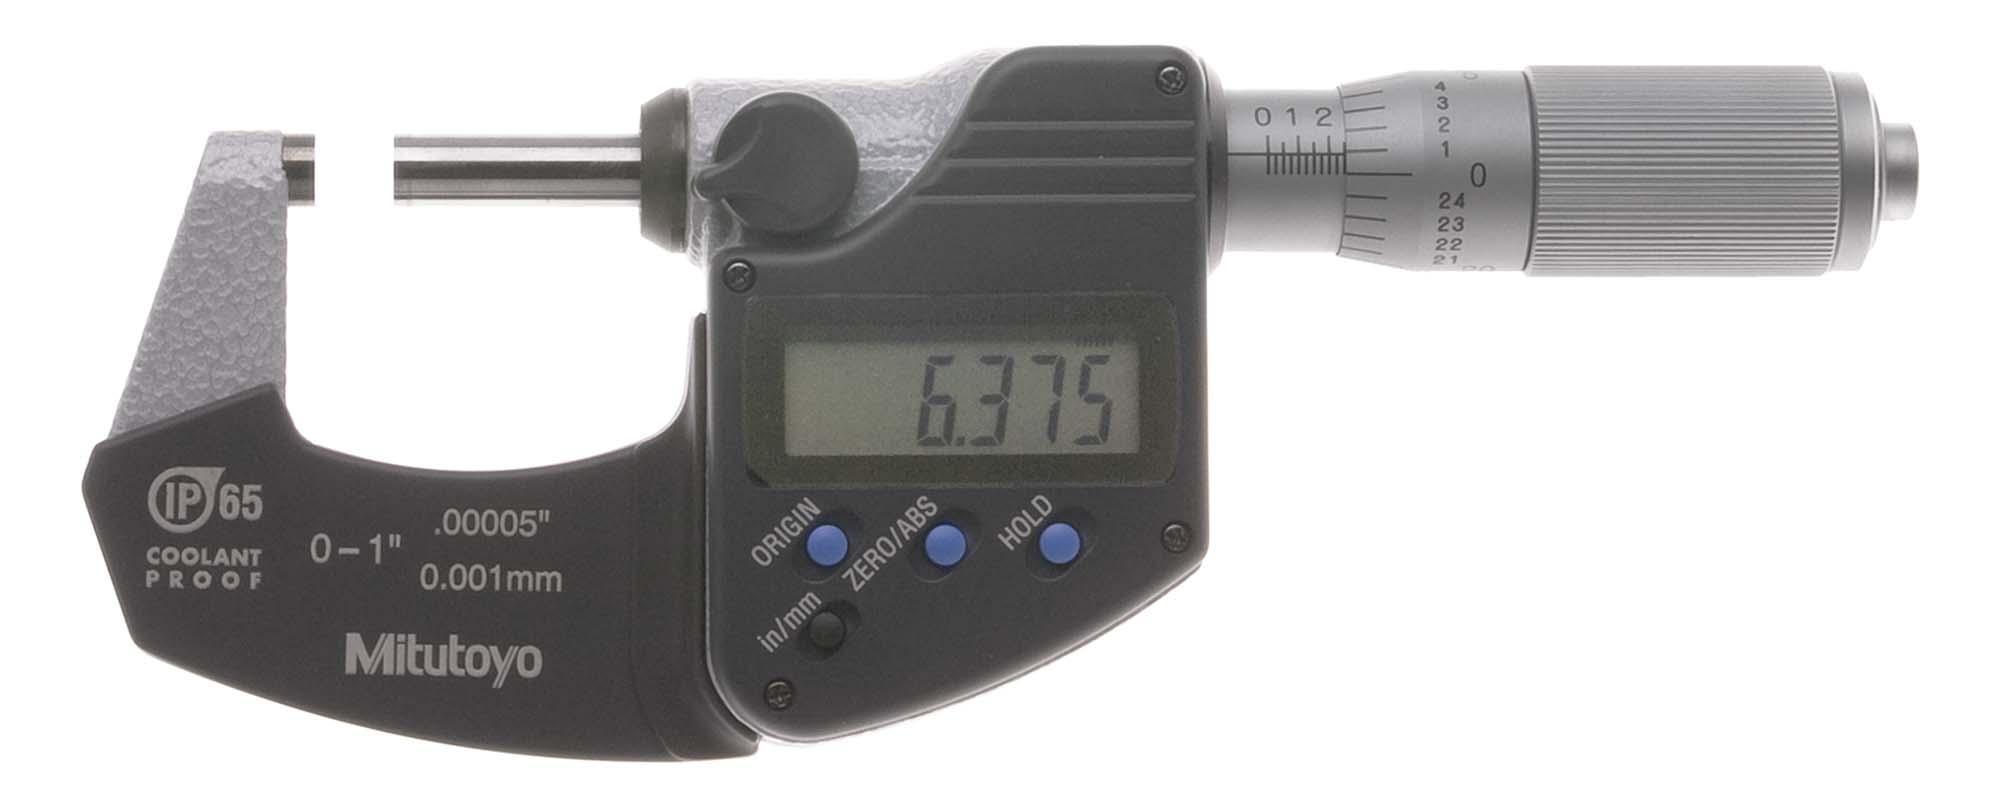 Mitutoyo 293-831 Slim LCD Electronic Micrometer